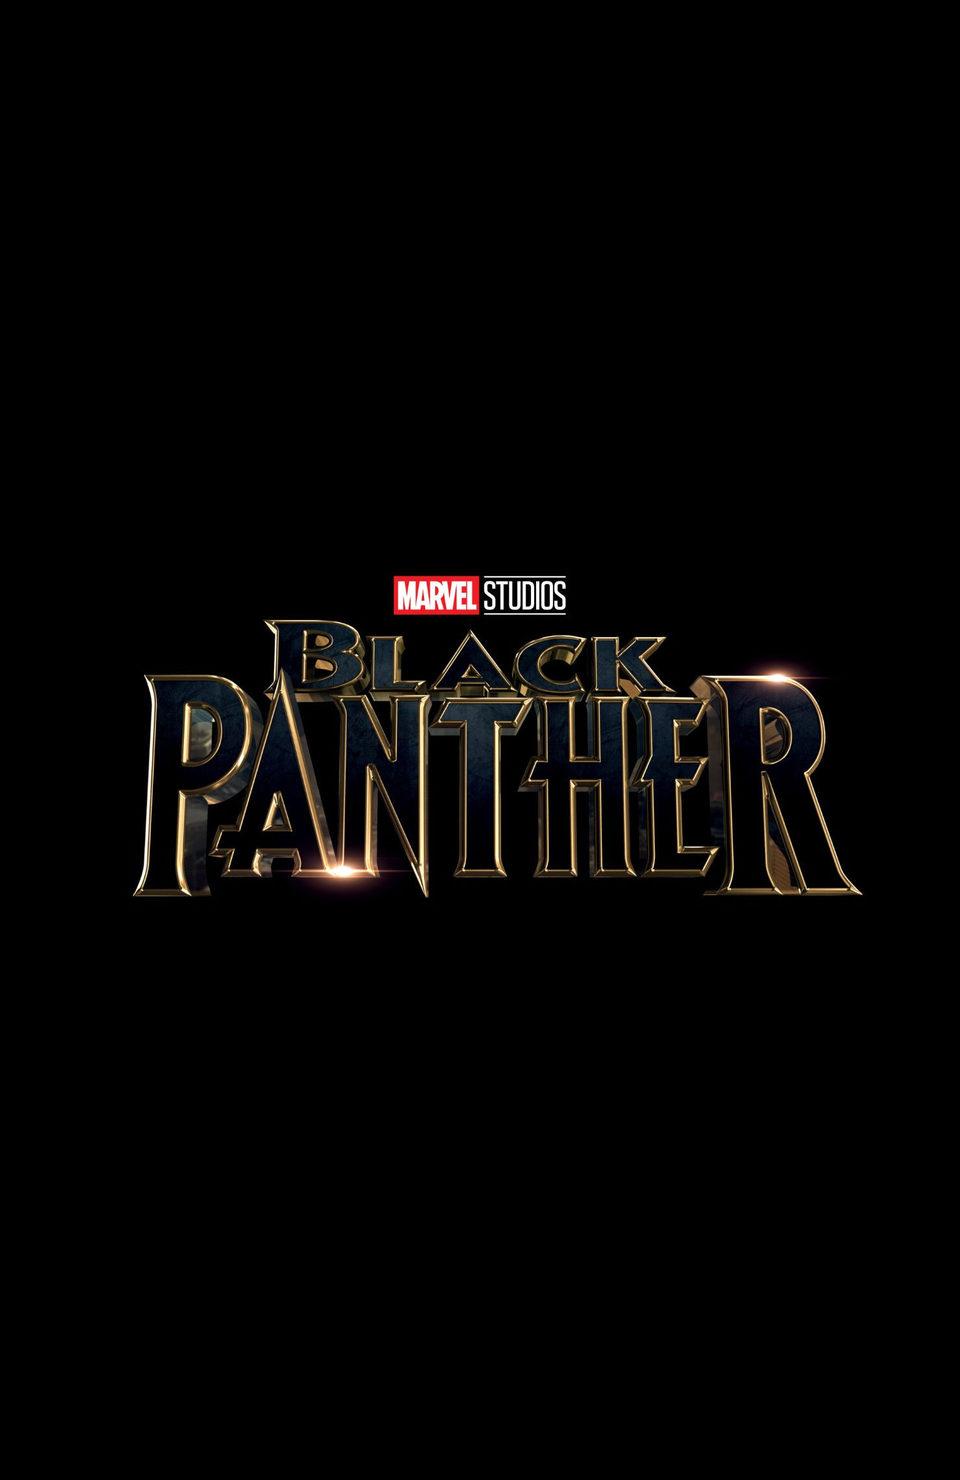 Cartel Logo Comic-Con San Diego 2016 de 'Black Panther'